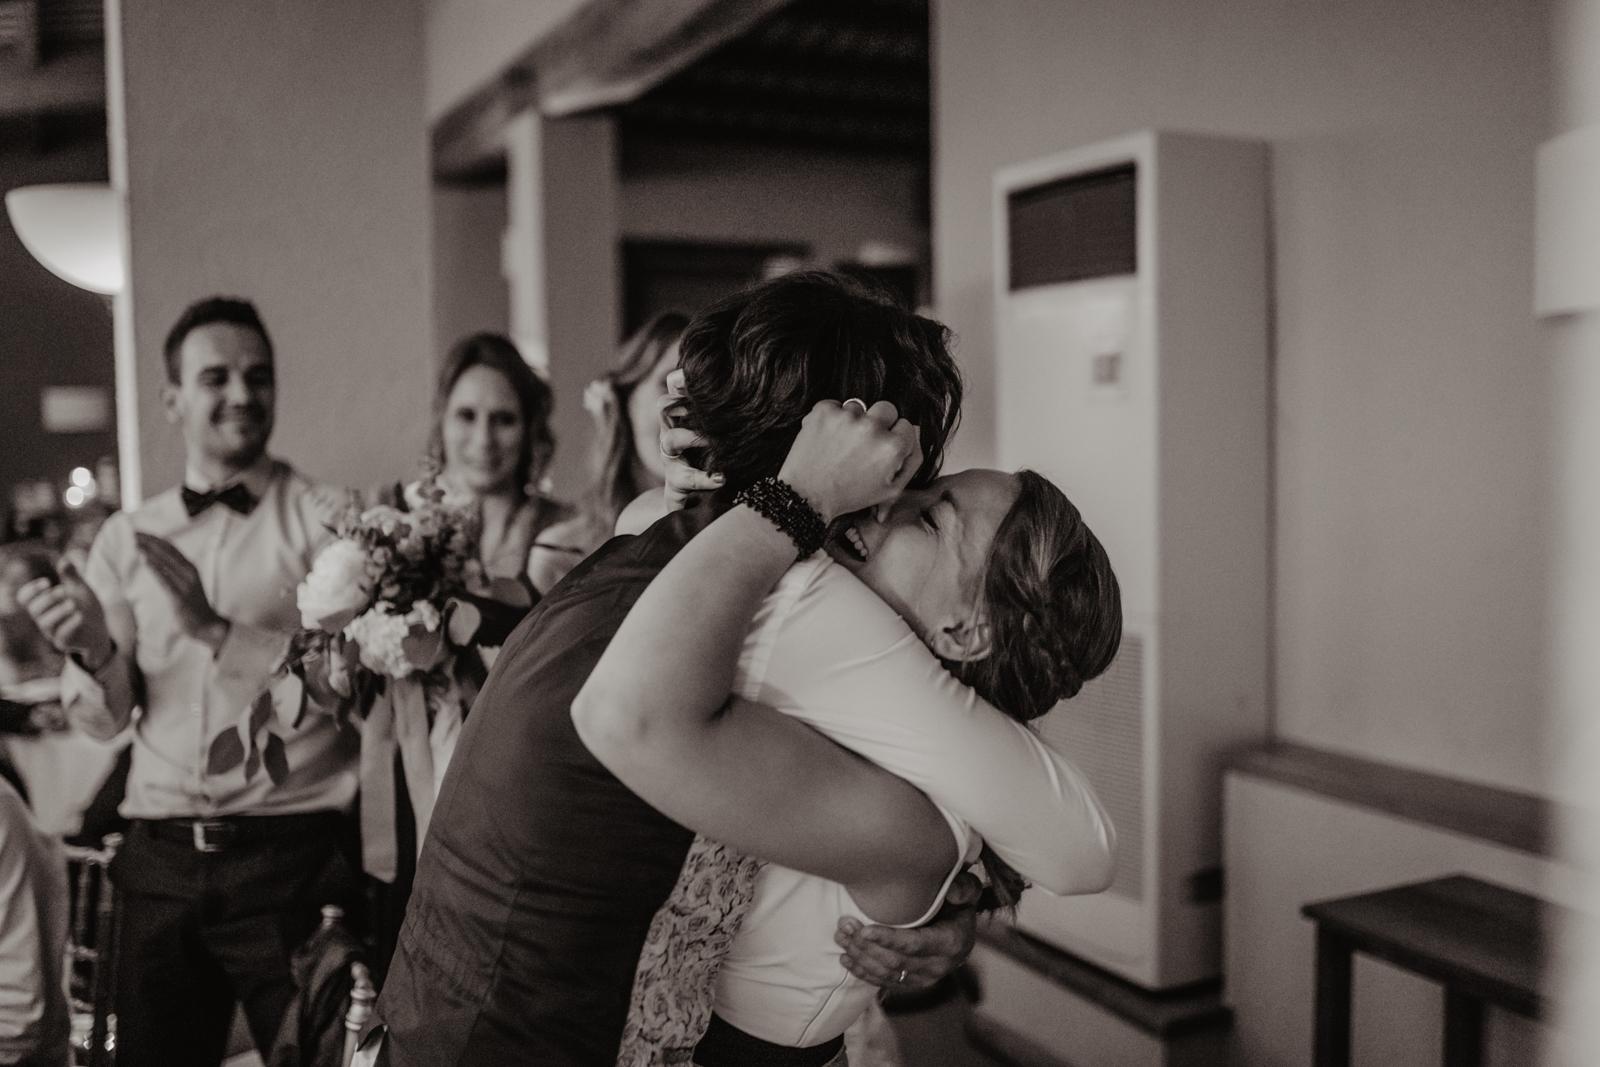 thenortherngirlphotography_photography_thenortherngirl_rebeccascabros_wedding_weddingphotography_weddingphotographer_barcelona_bodaenbarcelona_bodaenmaselmarti_bodarogeryvane-891.jpg